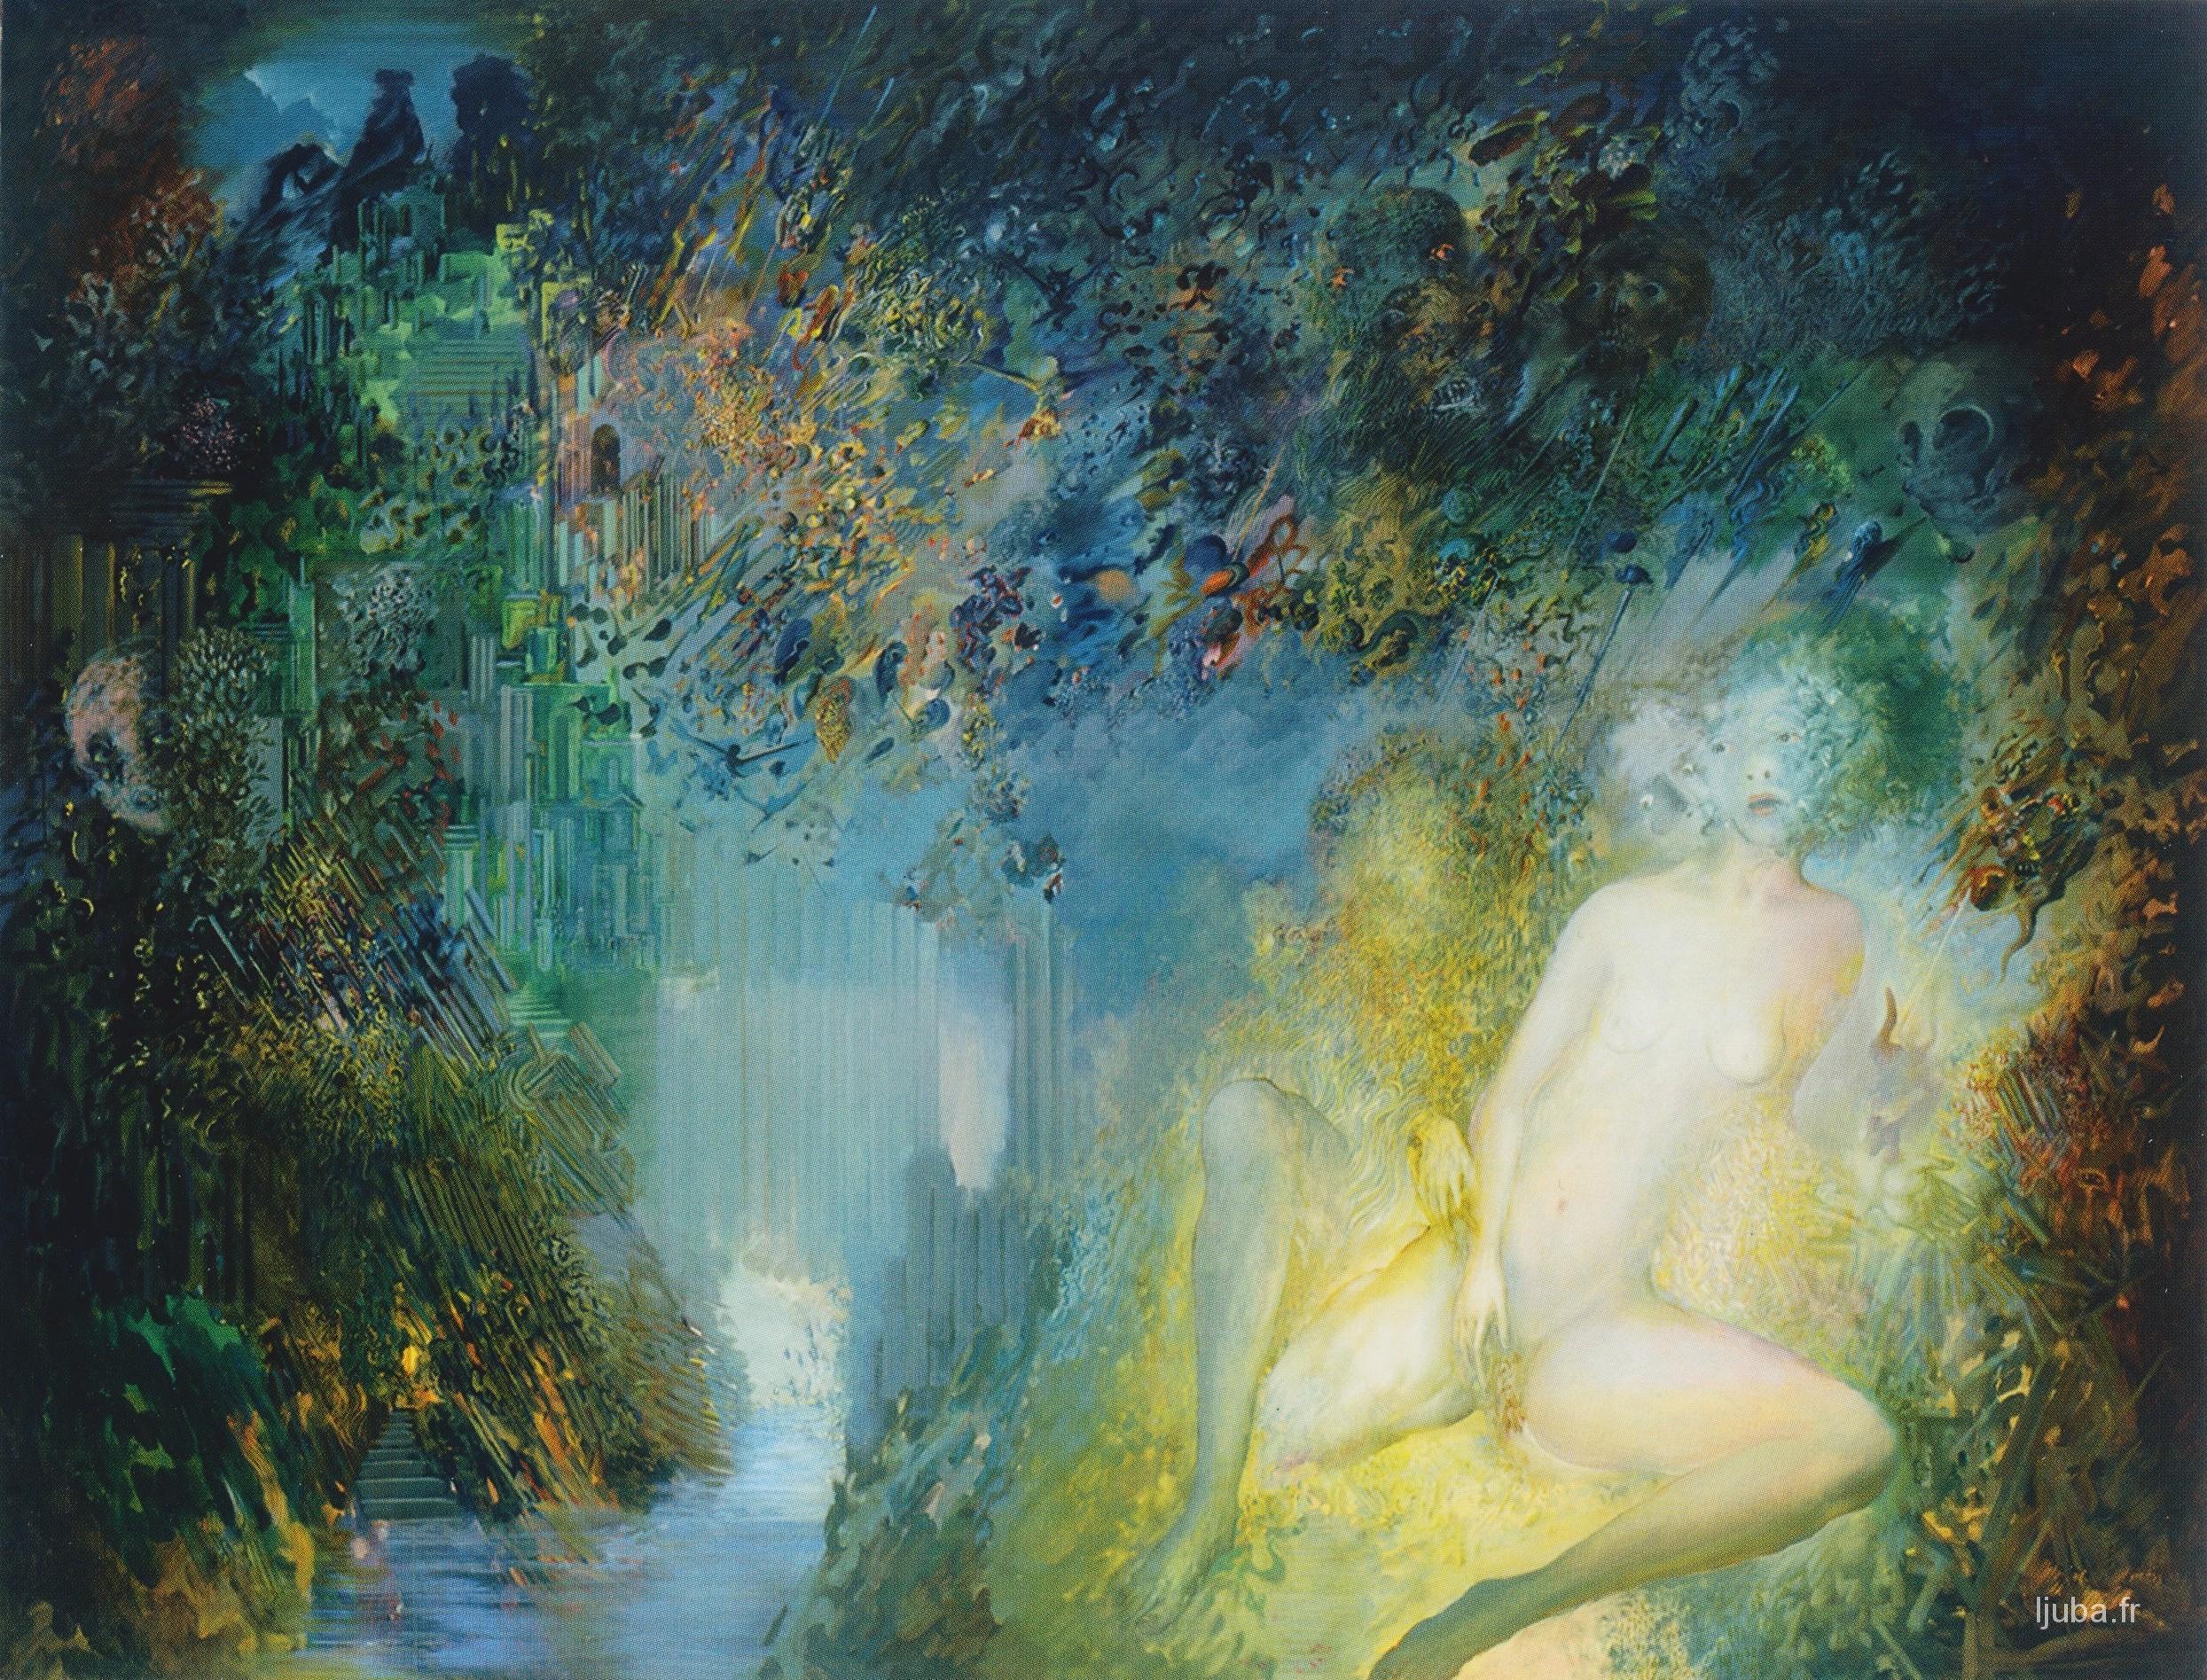 Ljuba Popovic - Les Tentations, 1986